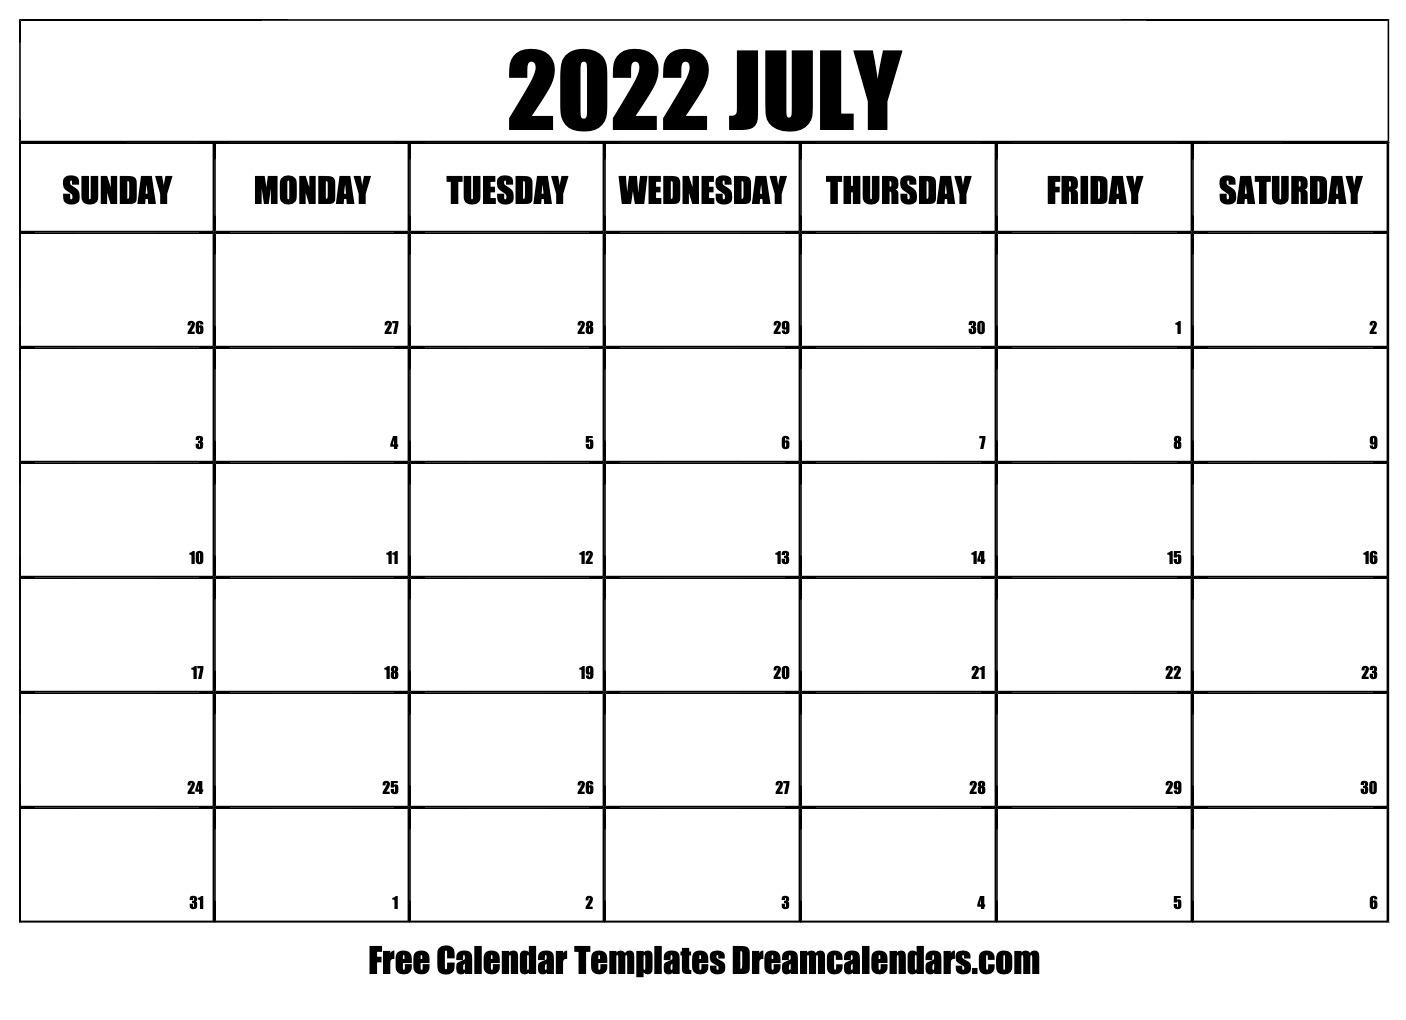 Blank July 2022 Calendar.July 2022 Calendar Free Blank Printable Templates